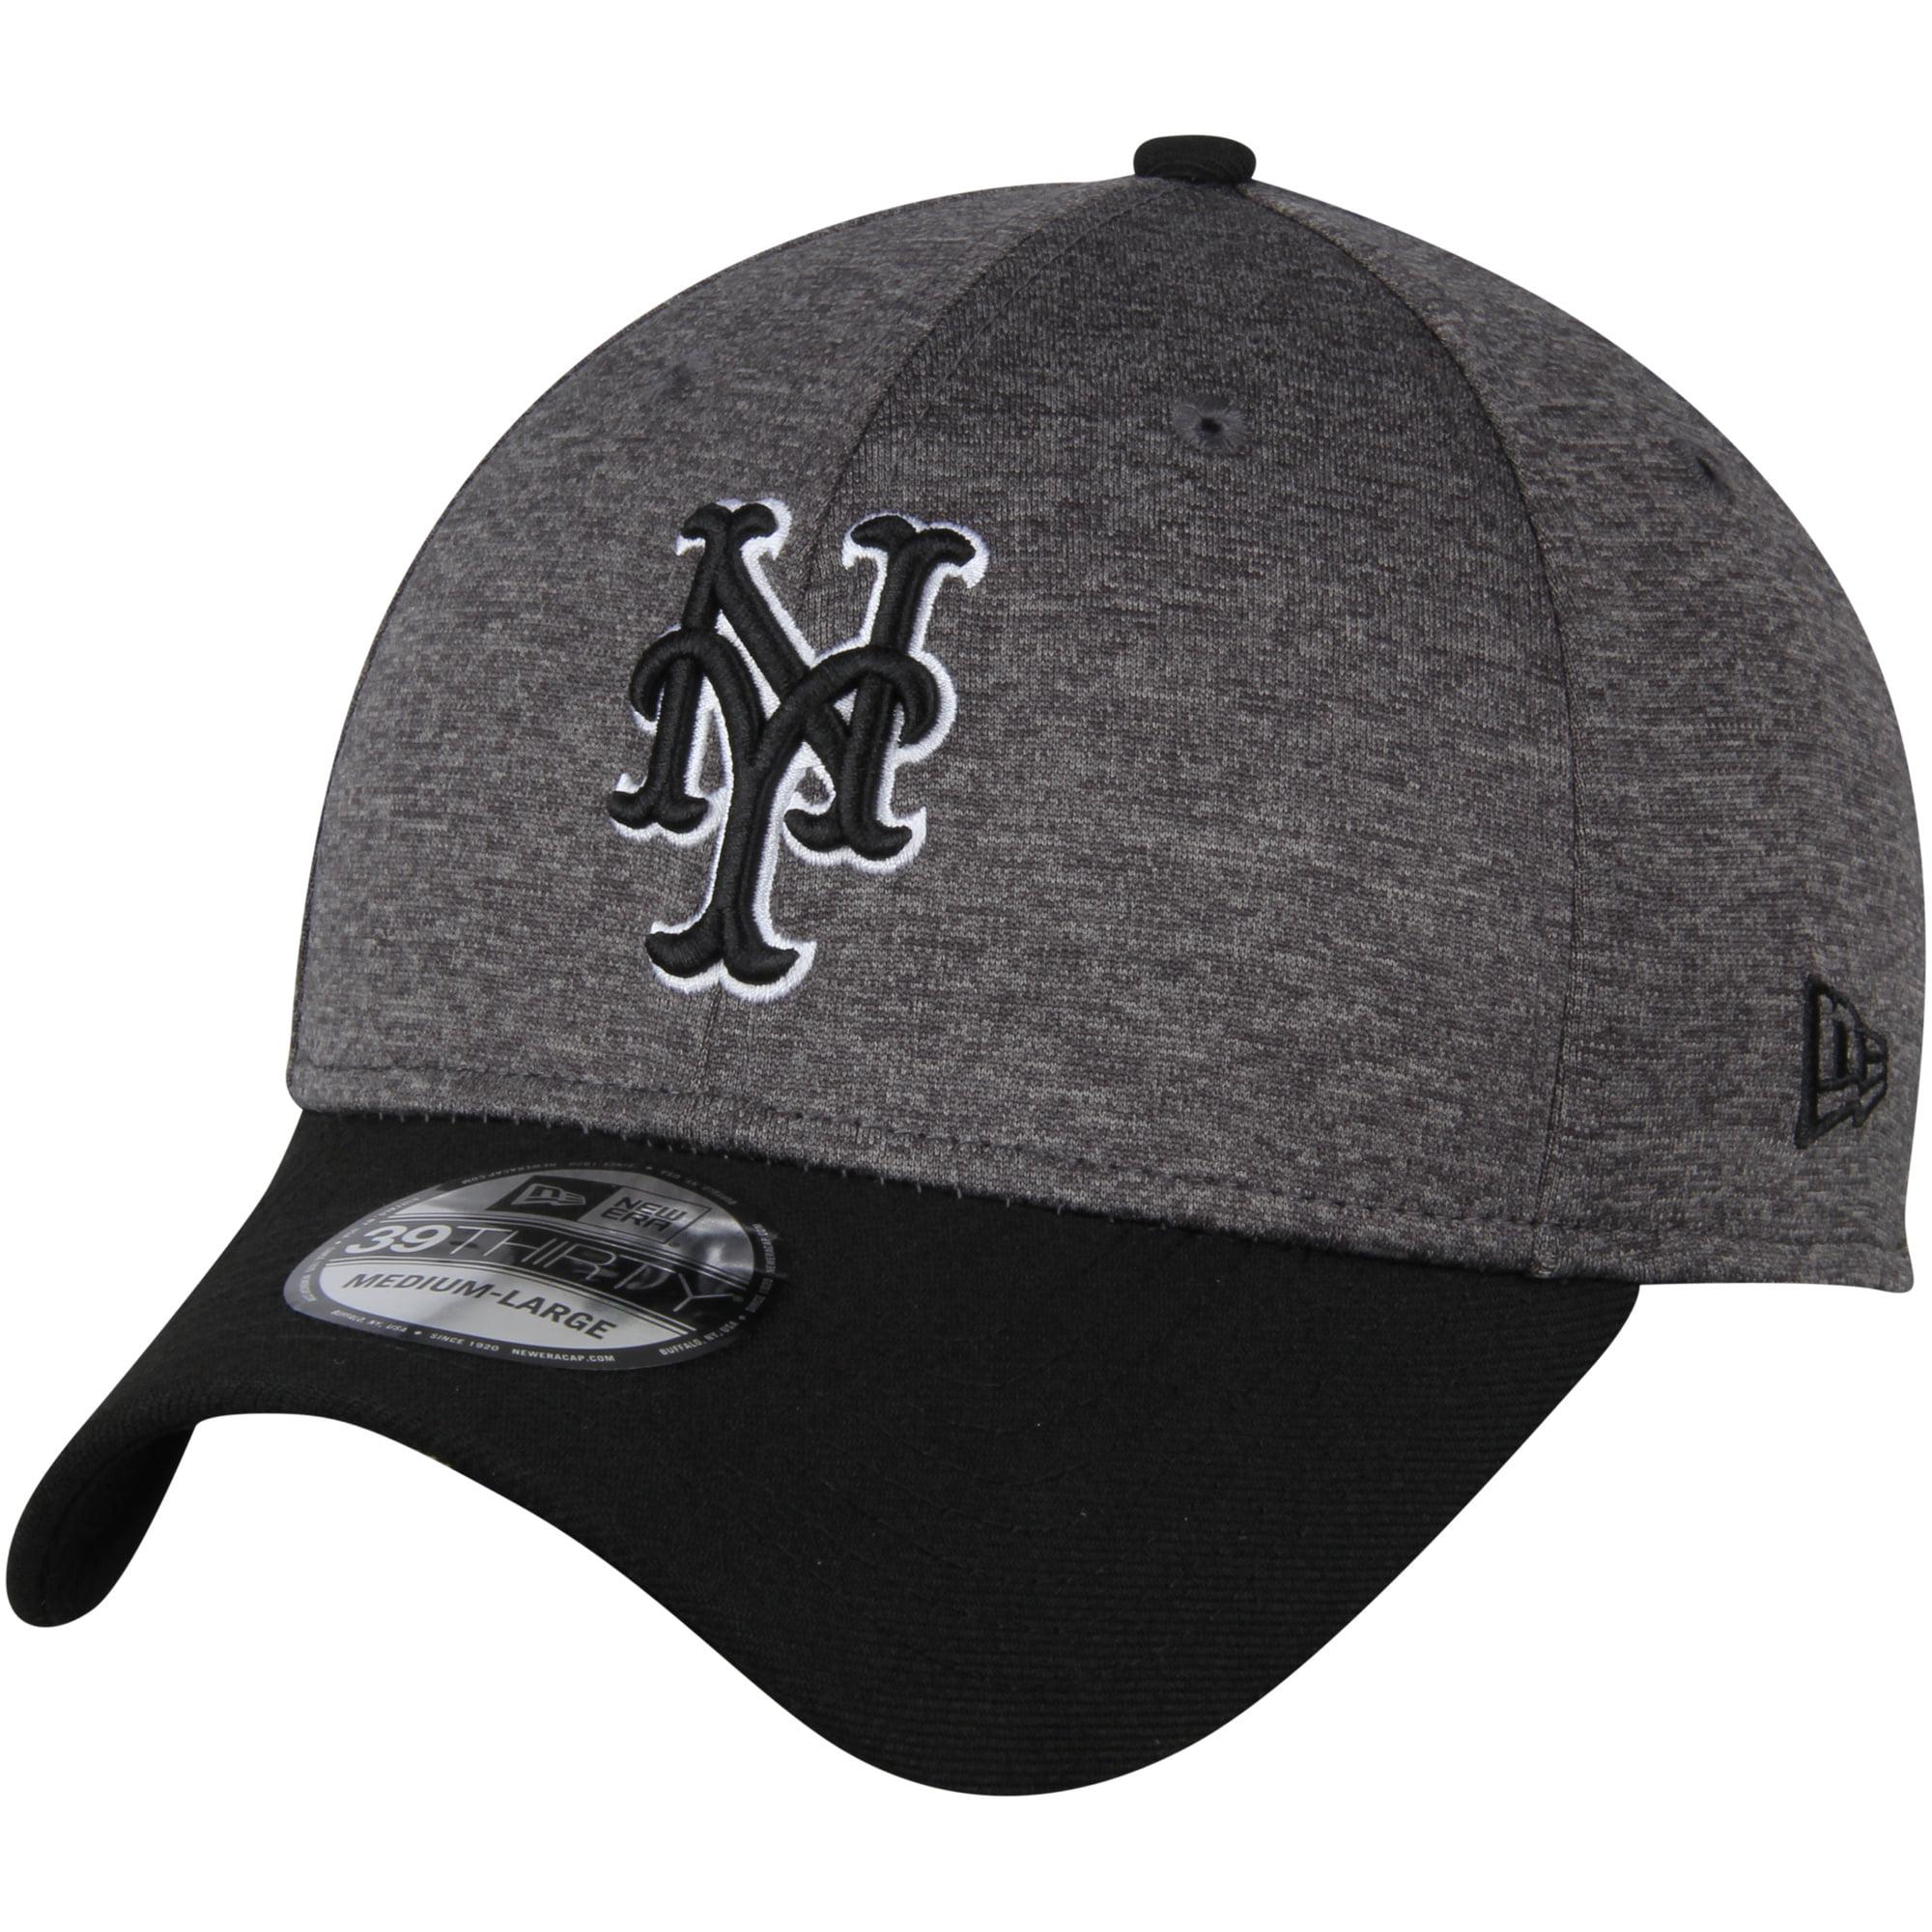 New York Mets New Era Shadow Tech 39THIRTY Flex Hat - Heathered Gray/Black - M/L